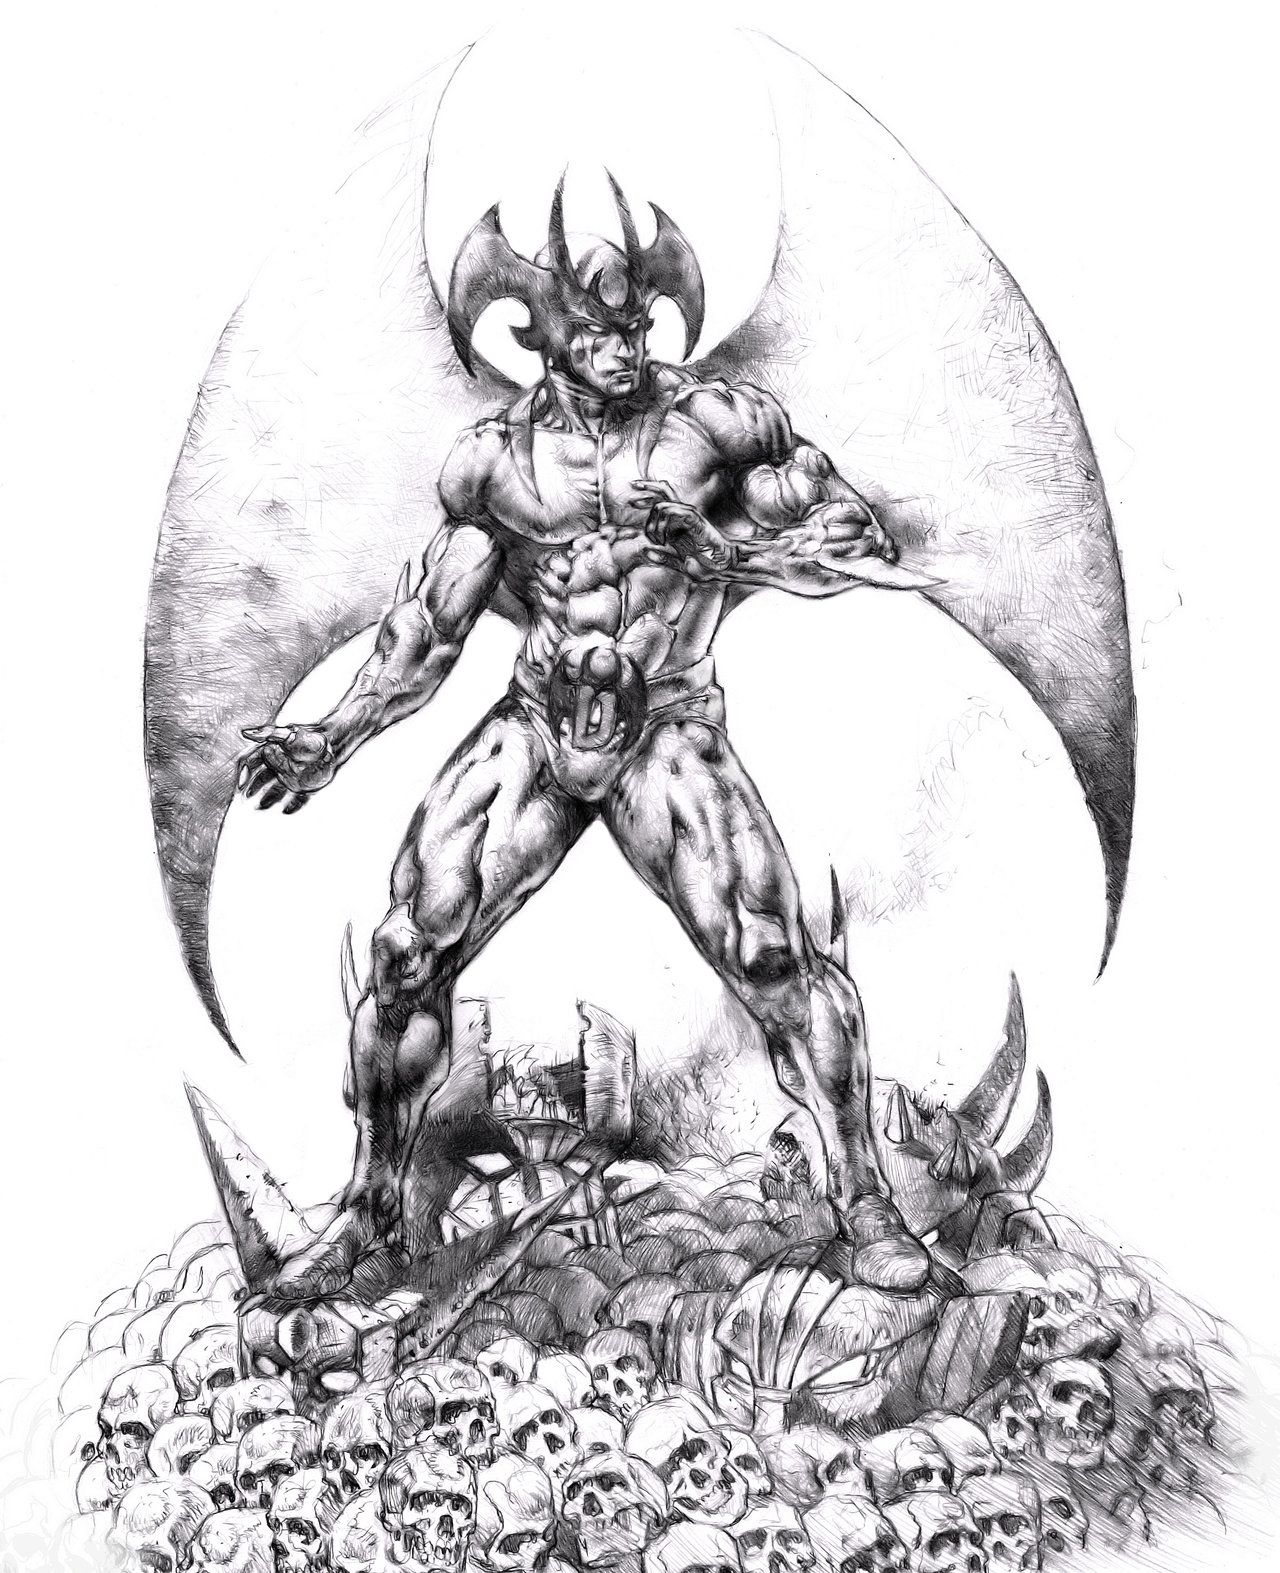 Devilman 2016 by dannycruz4 on DeviantArt | Dibujo | Pinterest ...